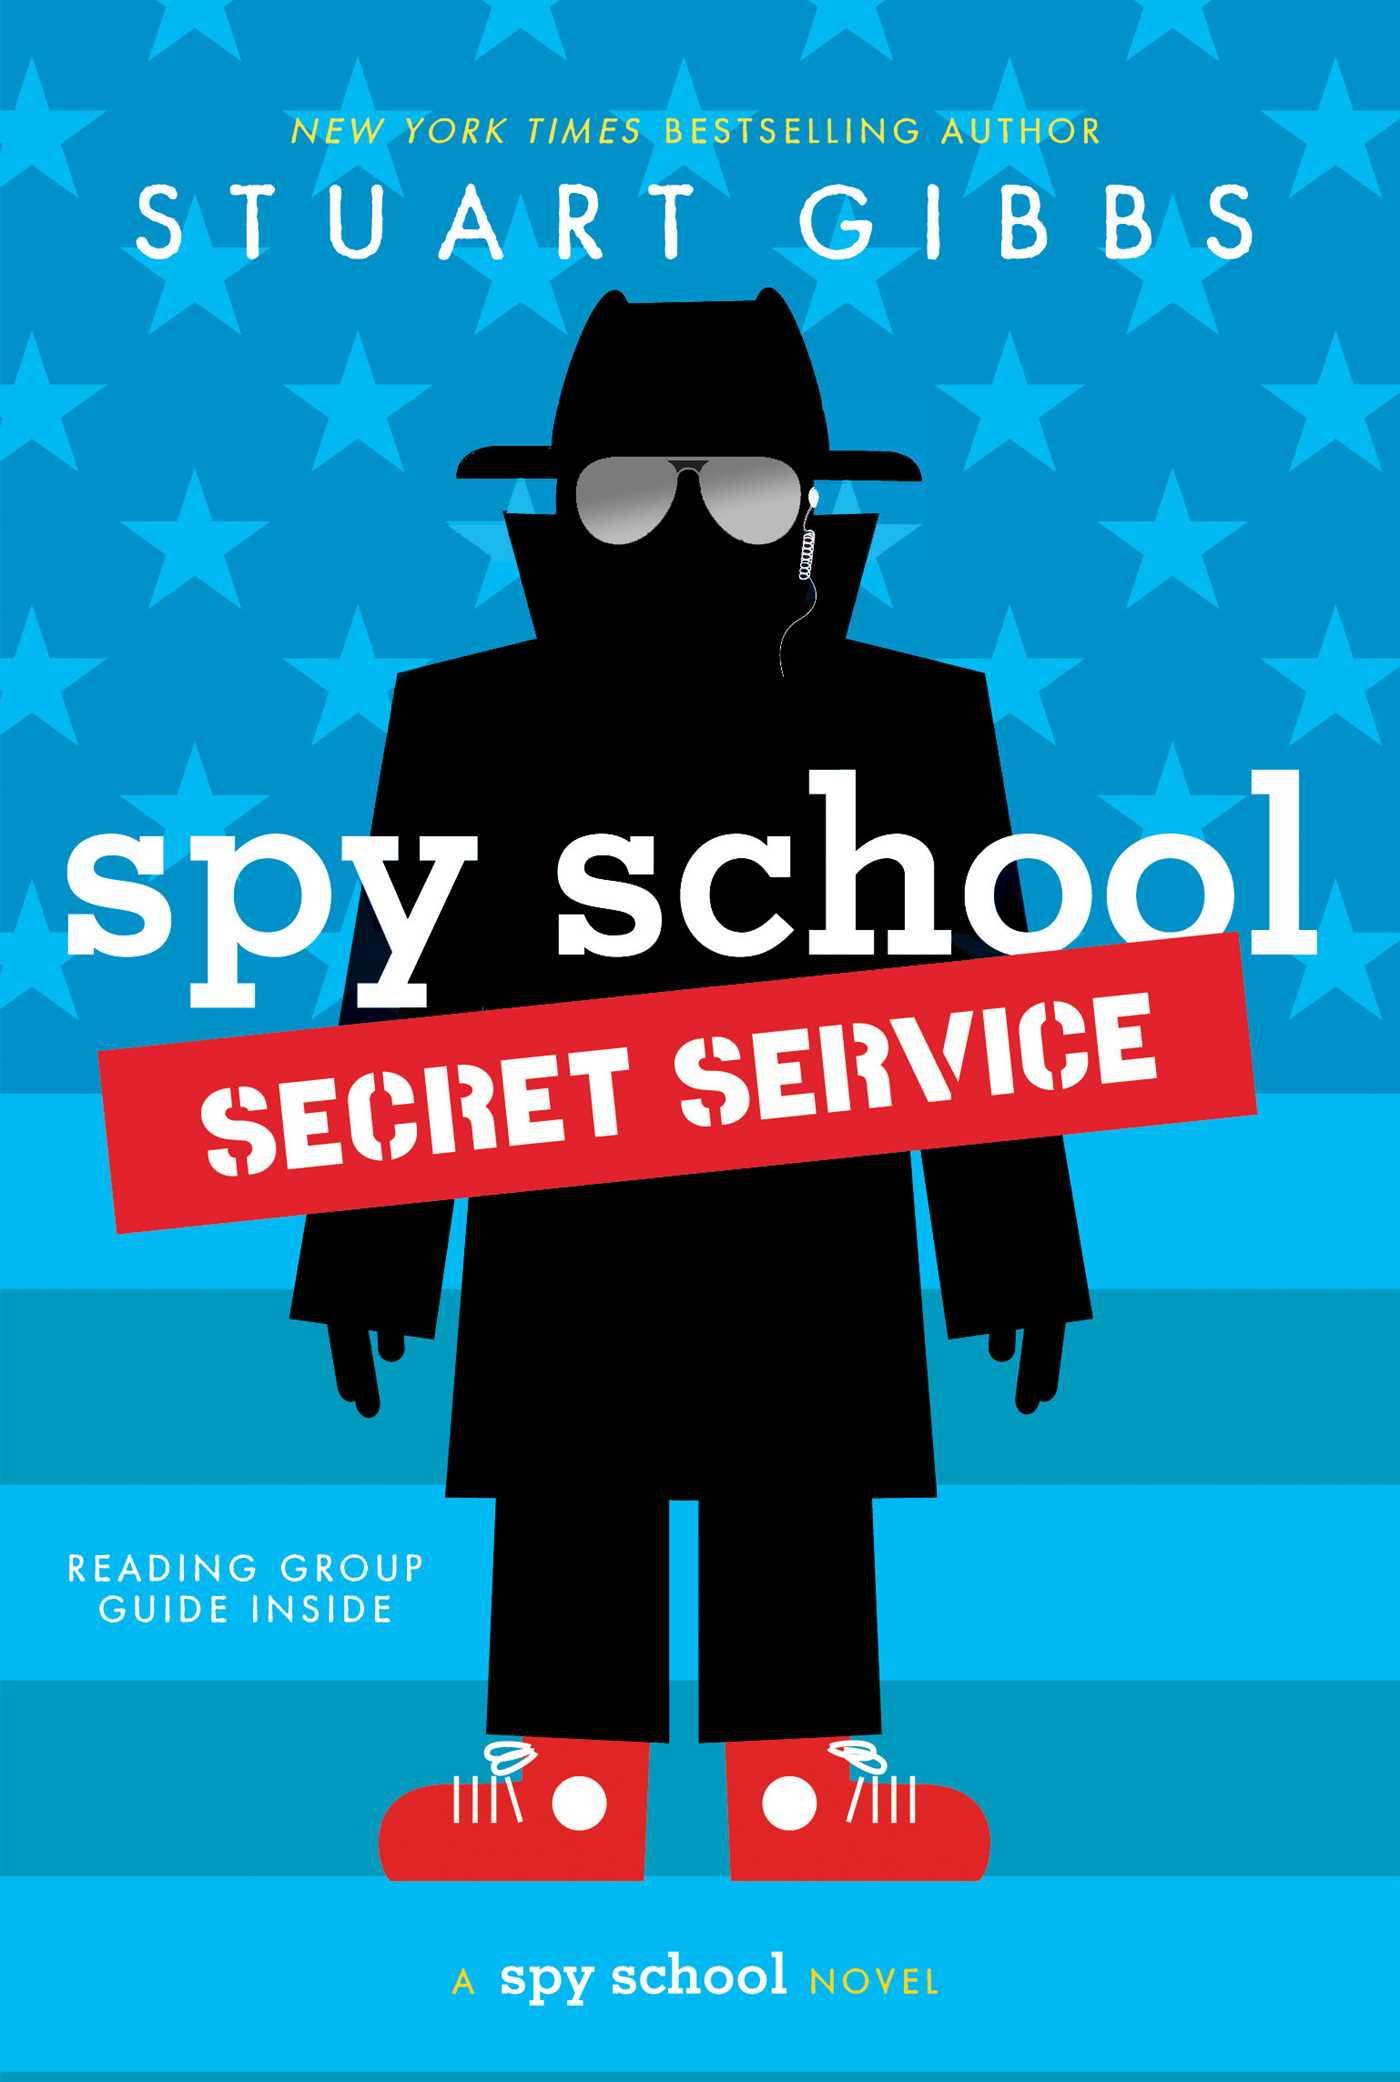 Spy school secret service 9781481477833 hr